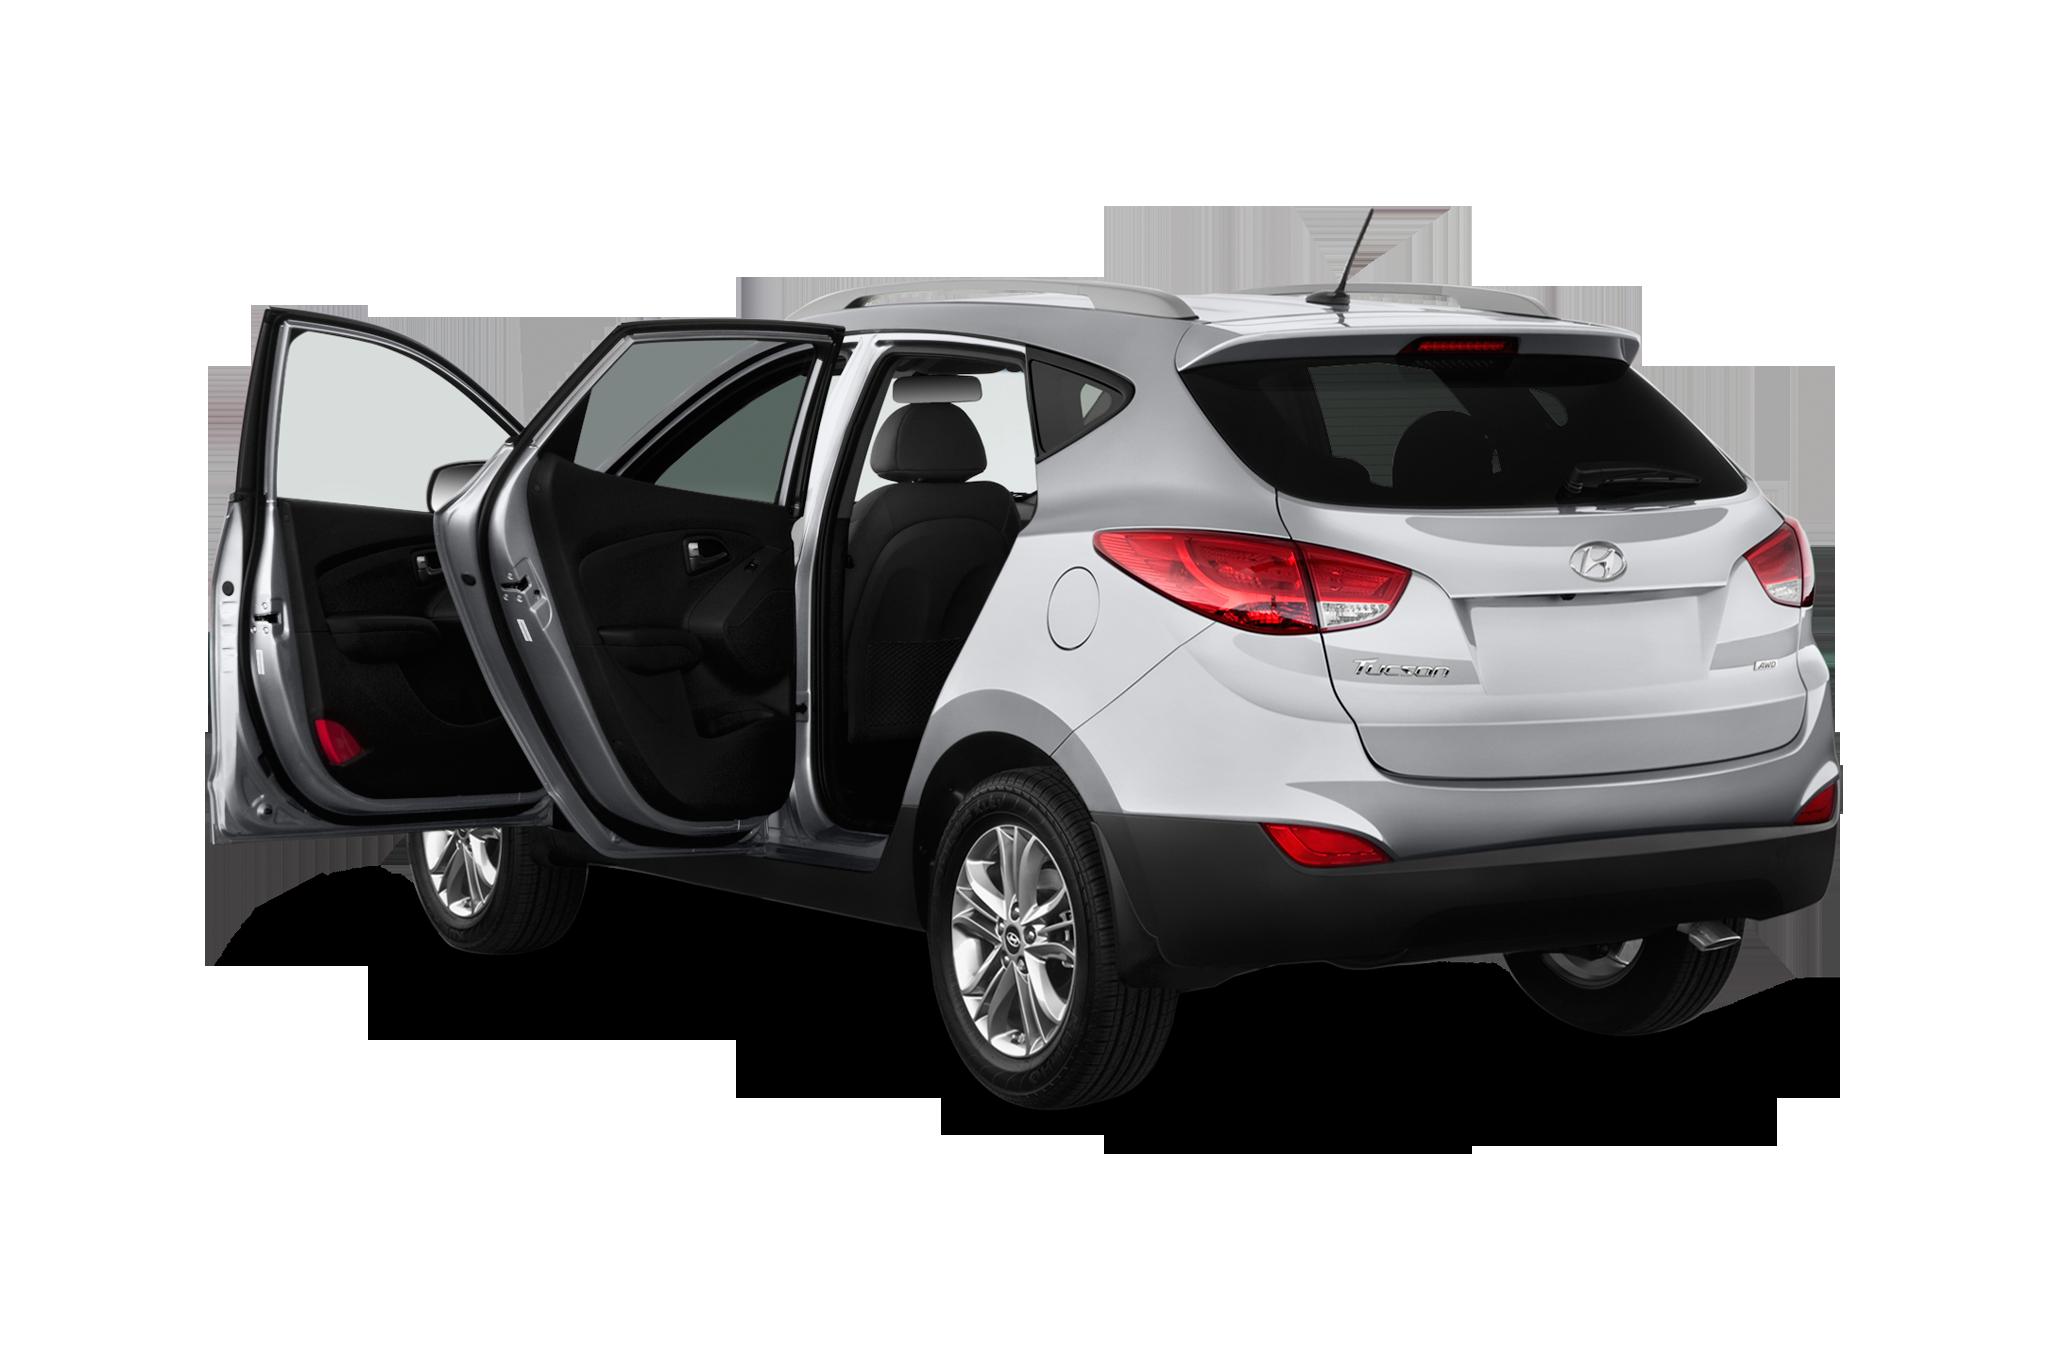 2015 Hyundai Tucson Priced From 22 375